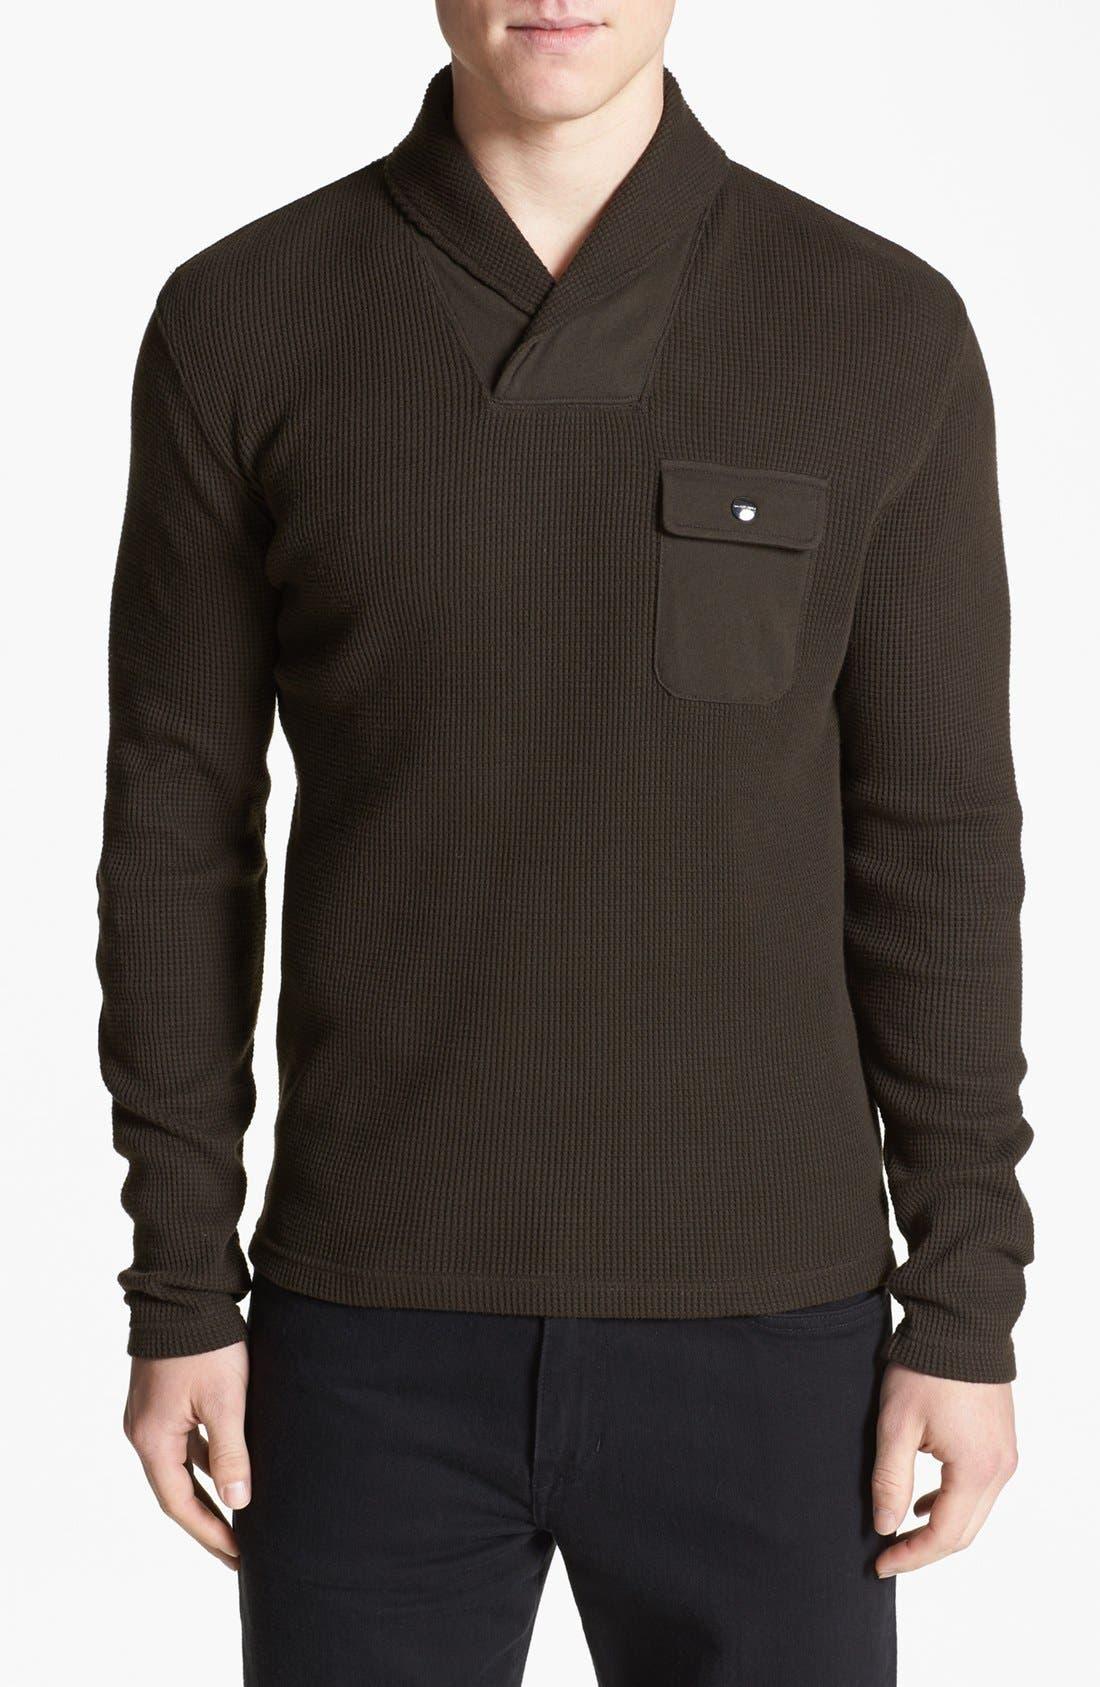 Alternate Image 1 Selected - Michael Kors 'Waffle Wrap' Sweater